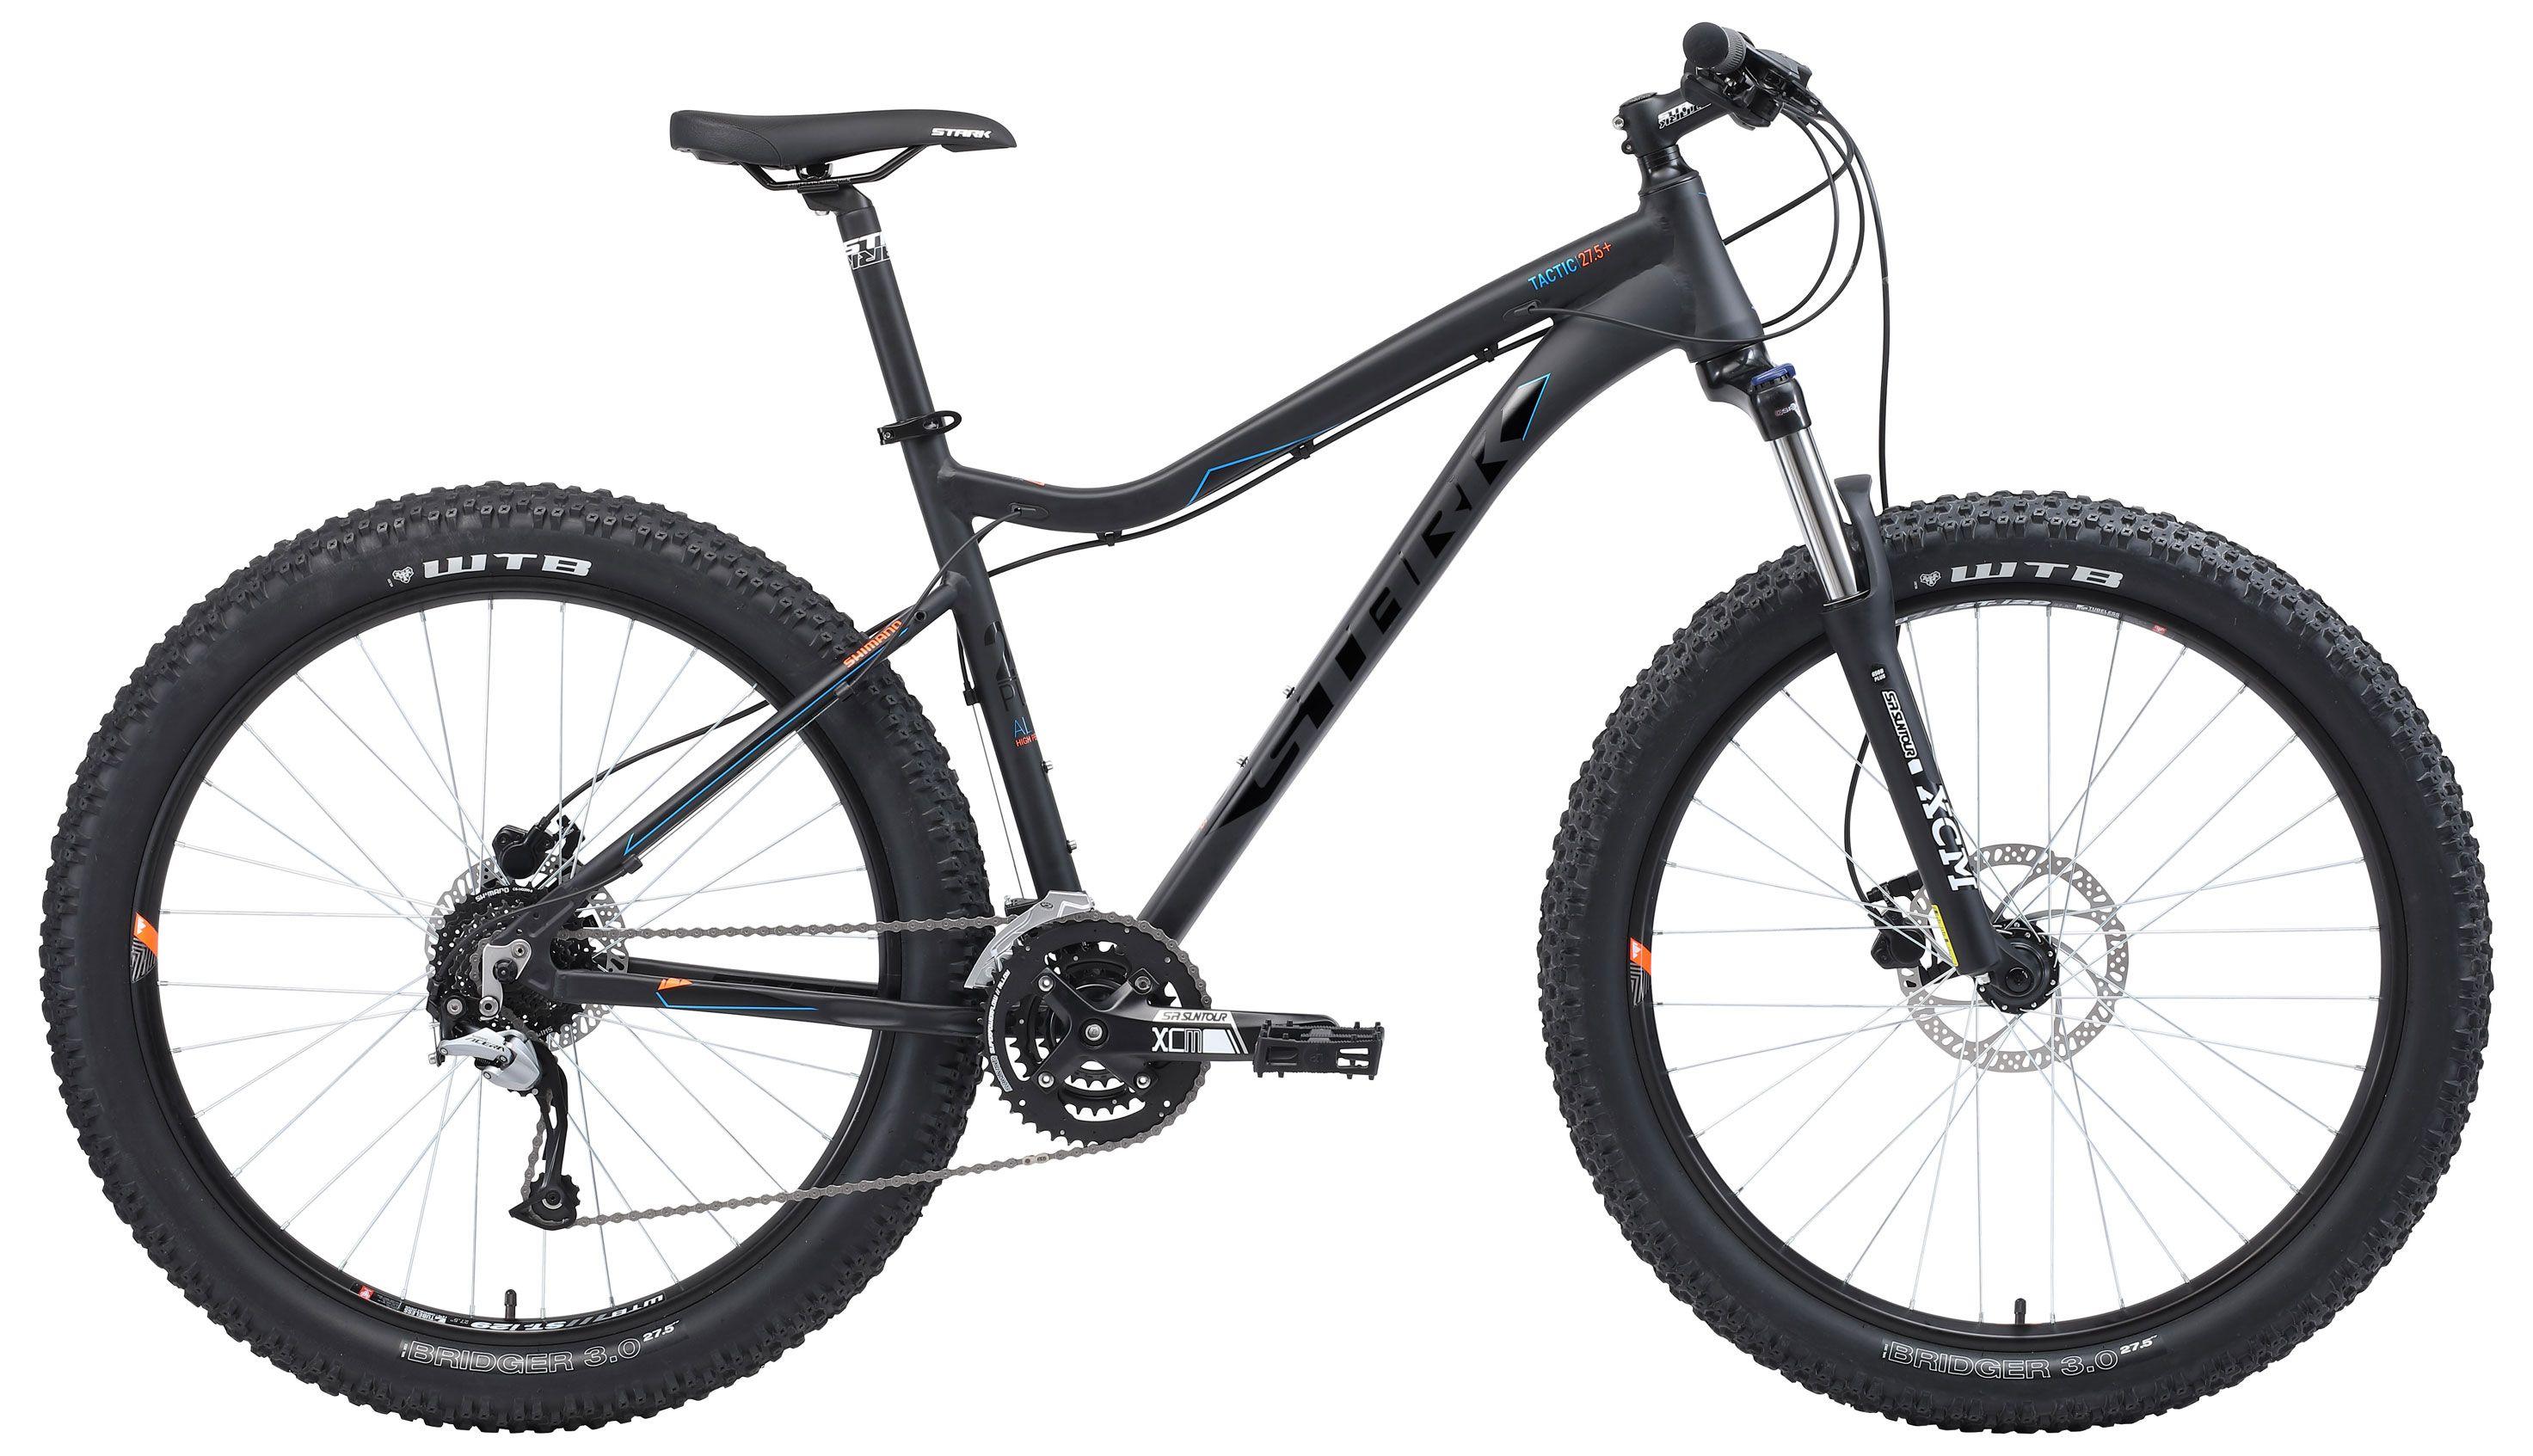 Велосипед Stark Tactic 27.5 + HD 2018 велосипед stark hunter 29 2 hd 2019